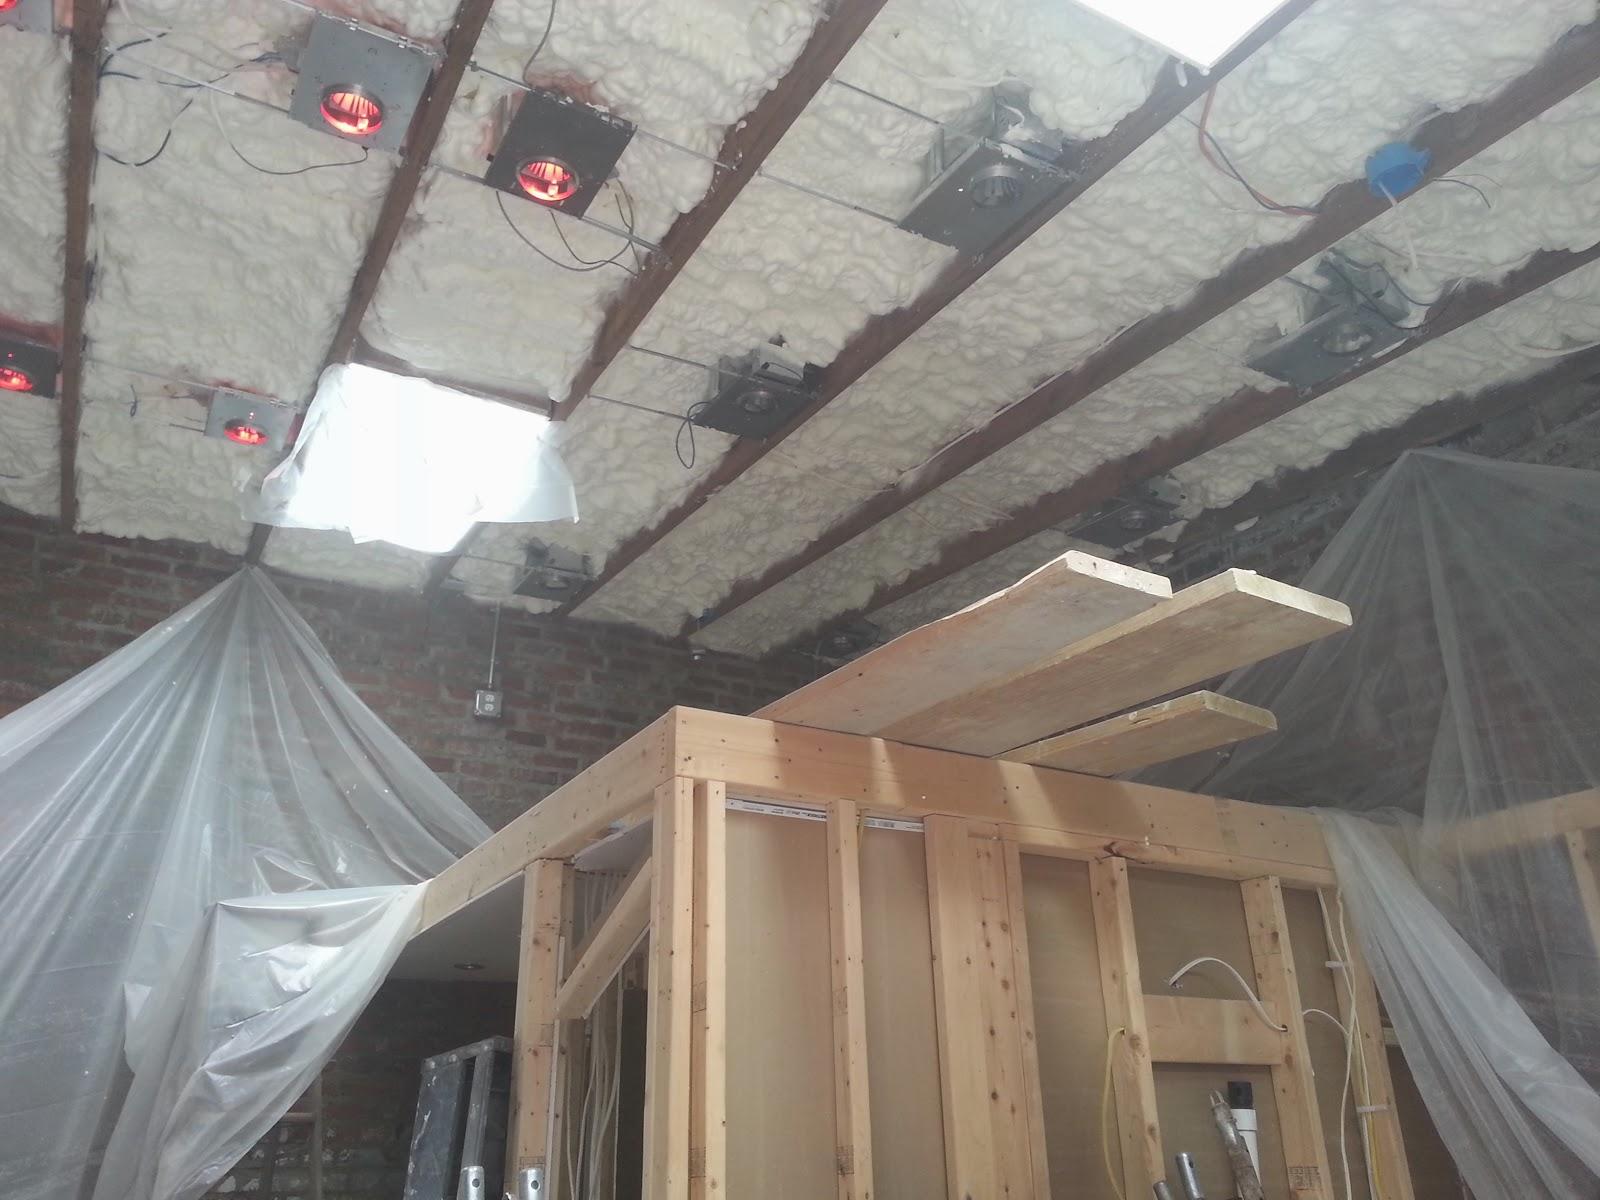 18-Insulation-sprayed-imgur-Storage-Unit-Renovation-in-Tiny-Architecture-www-designstack-co